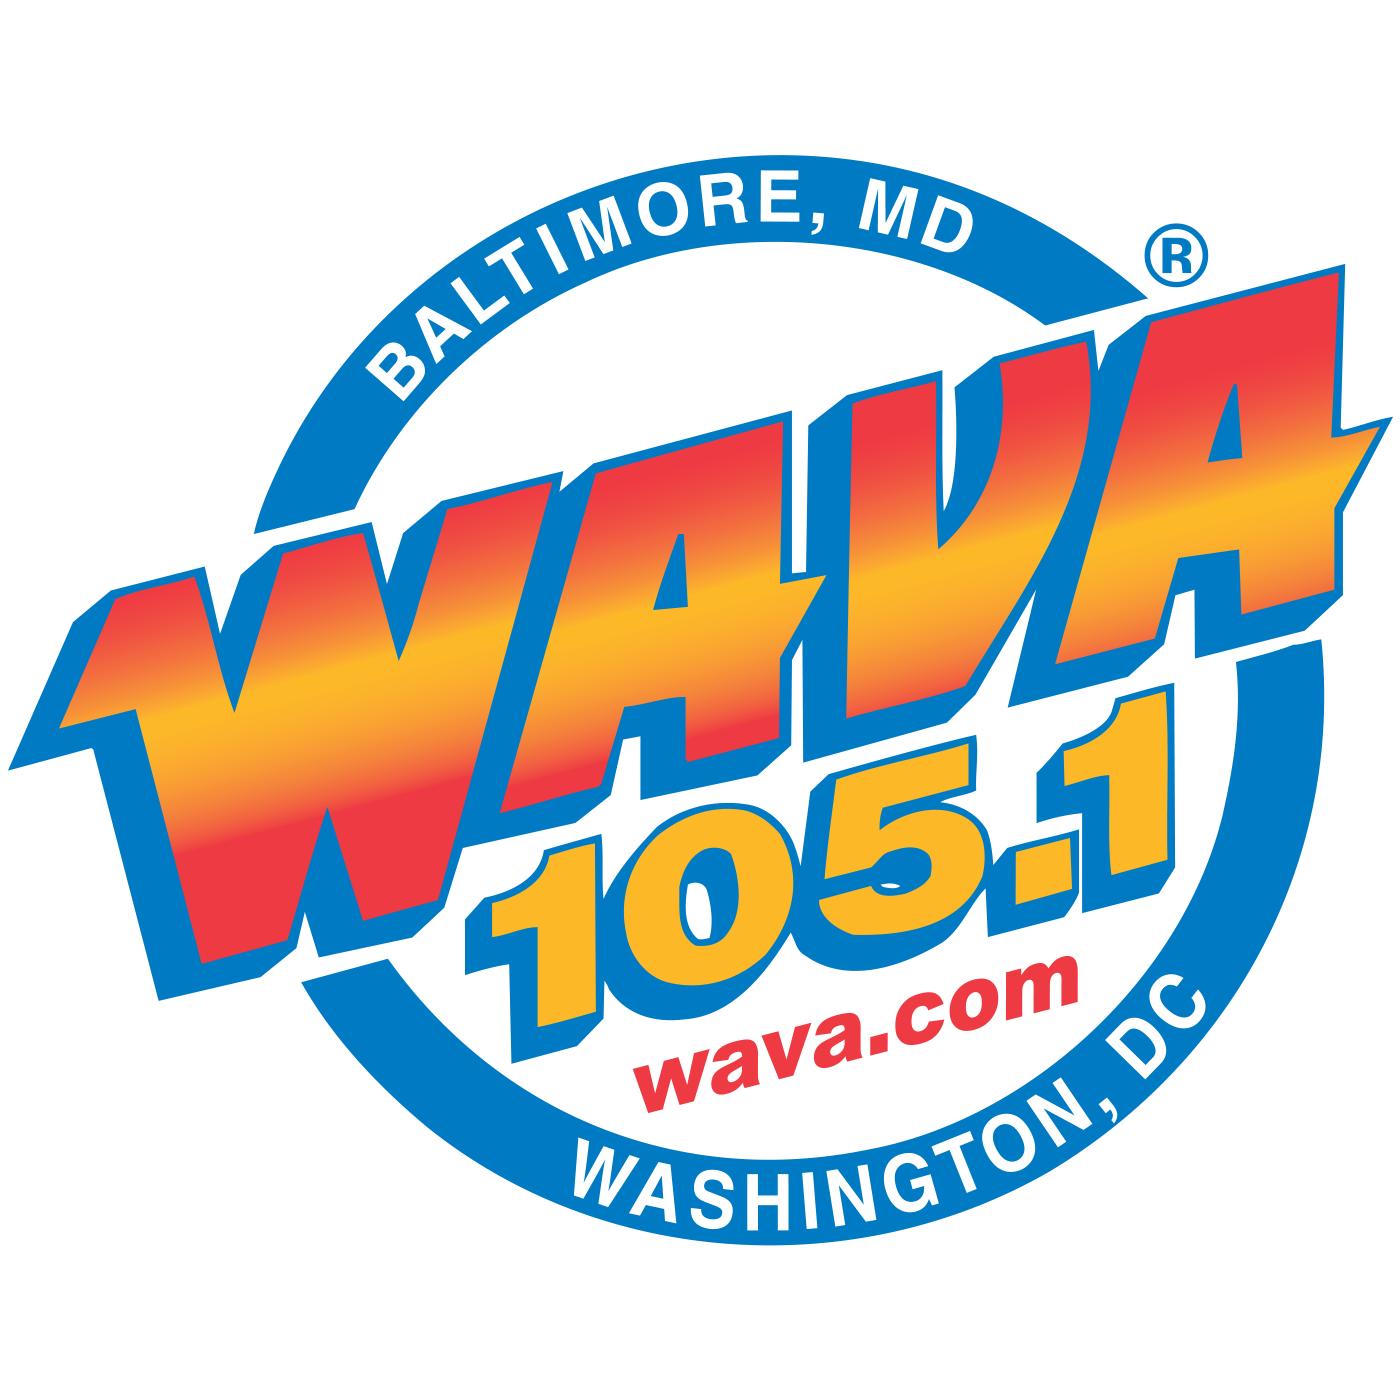 105.1 FM WAVA